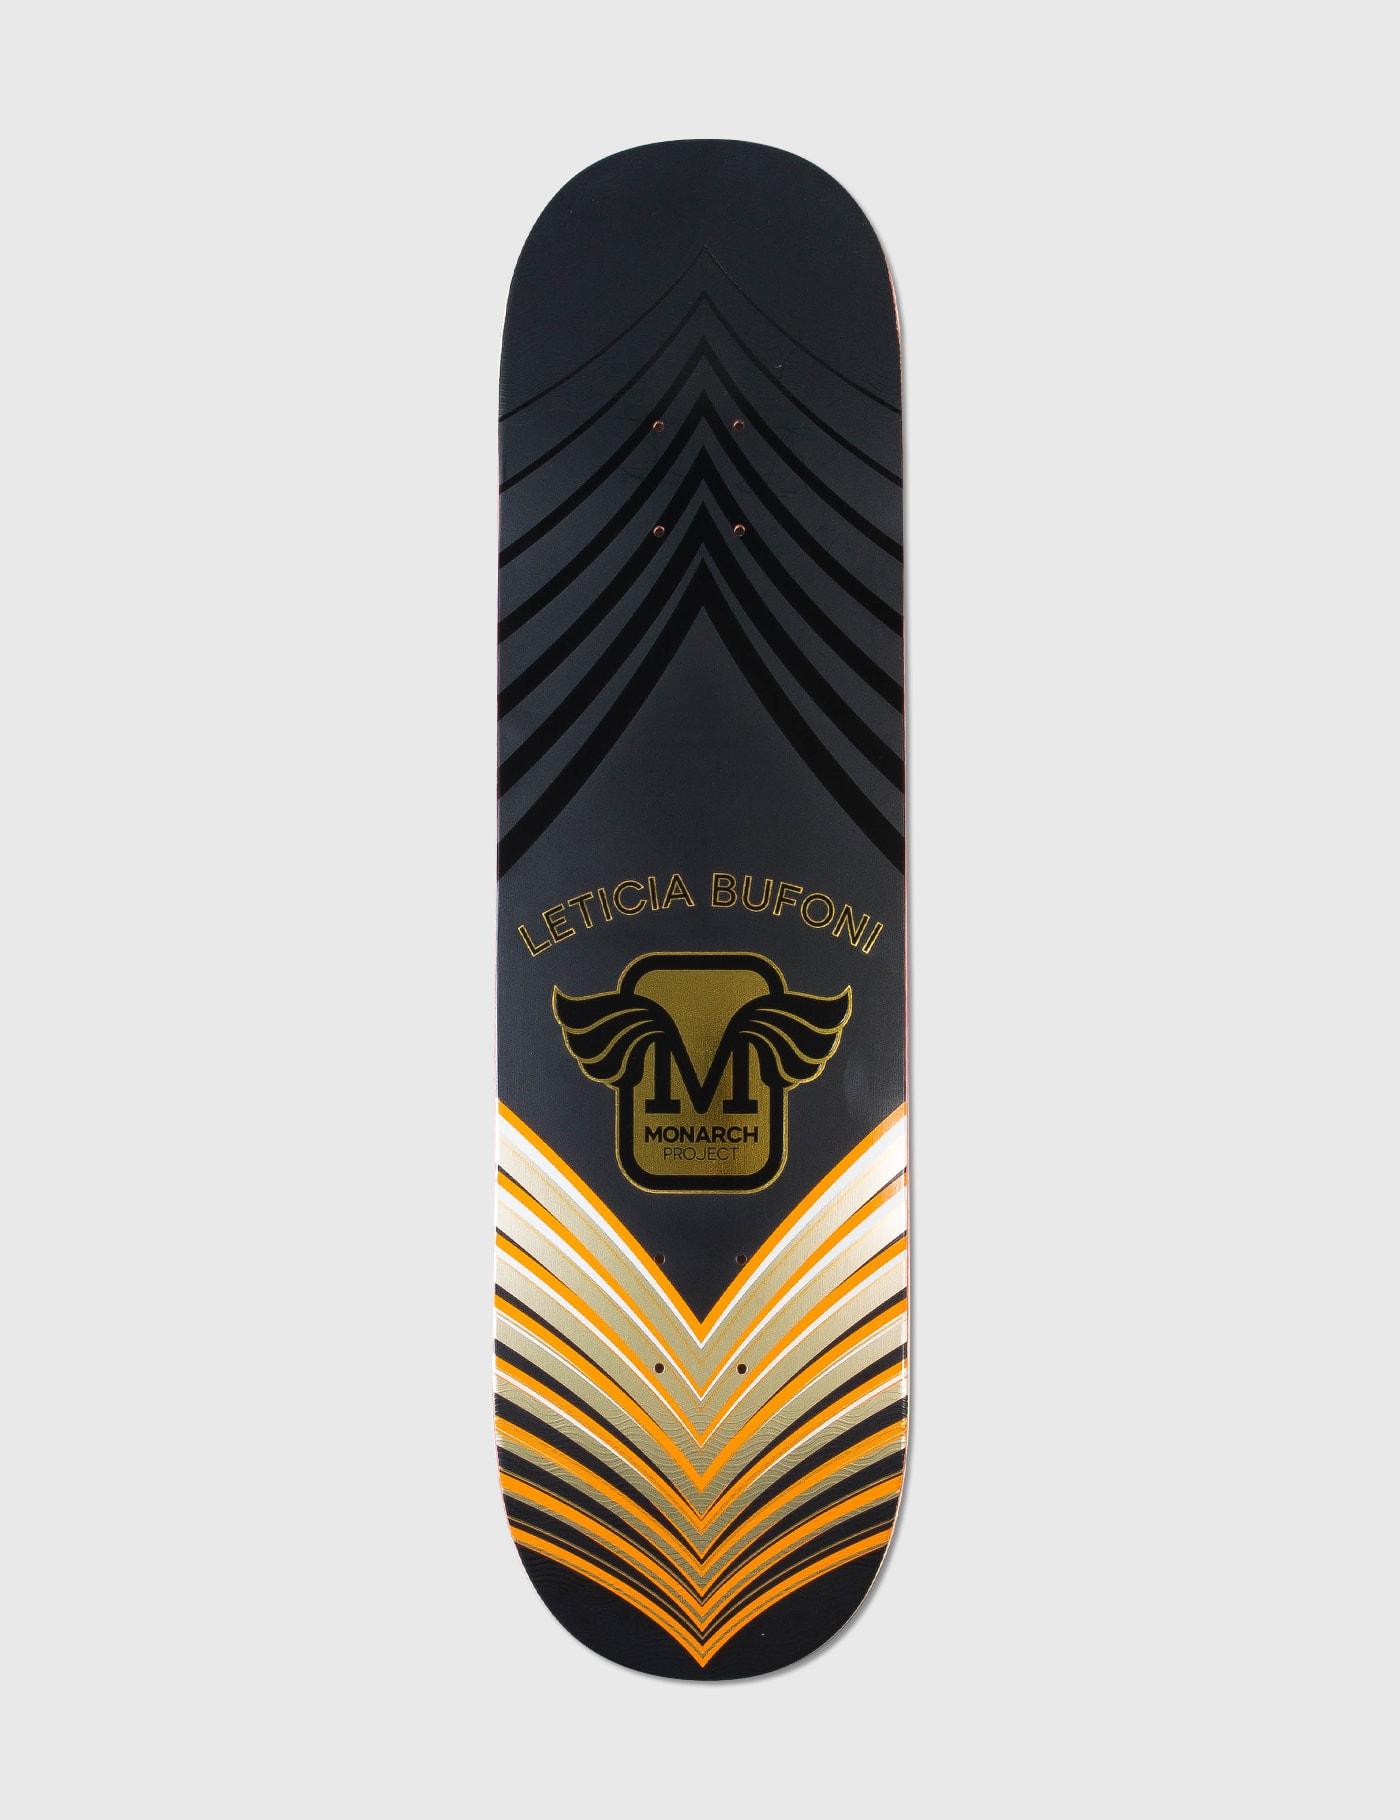 Monarch Project Leticia Bufoni | Horus Deck men